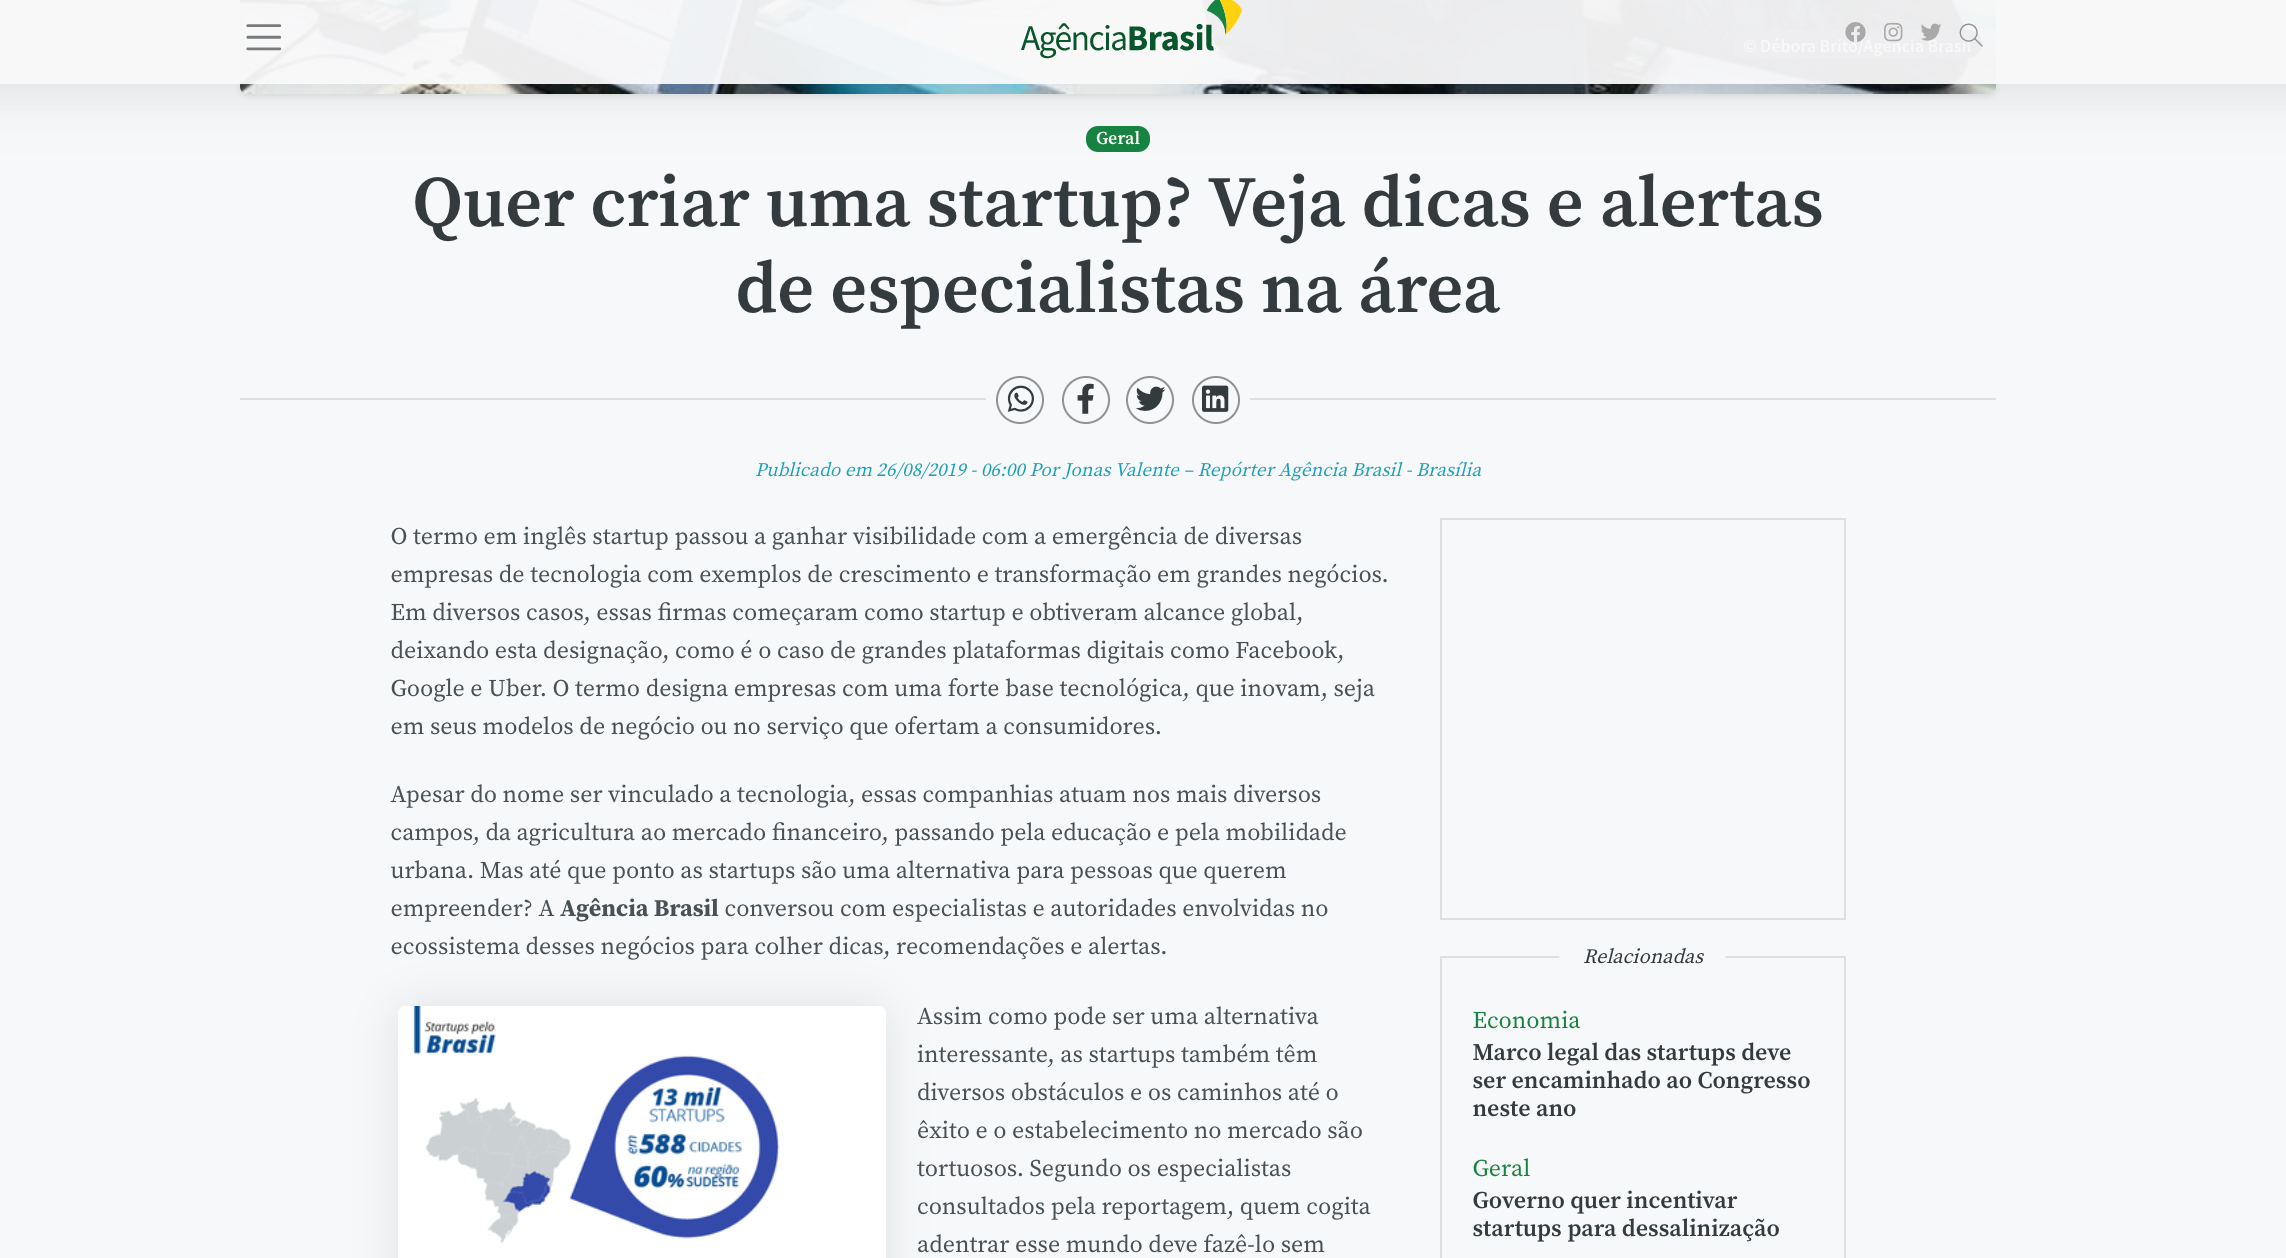 Print Noticias sobre startups